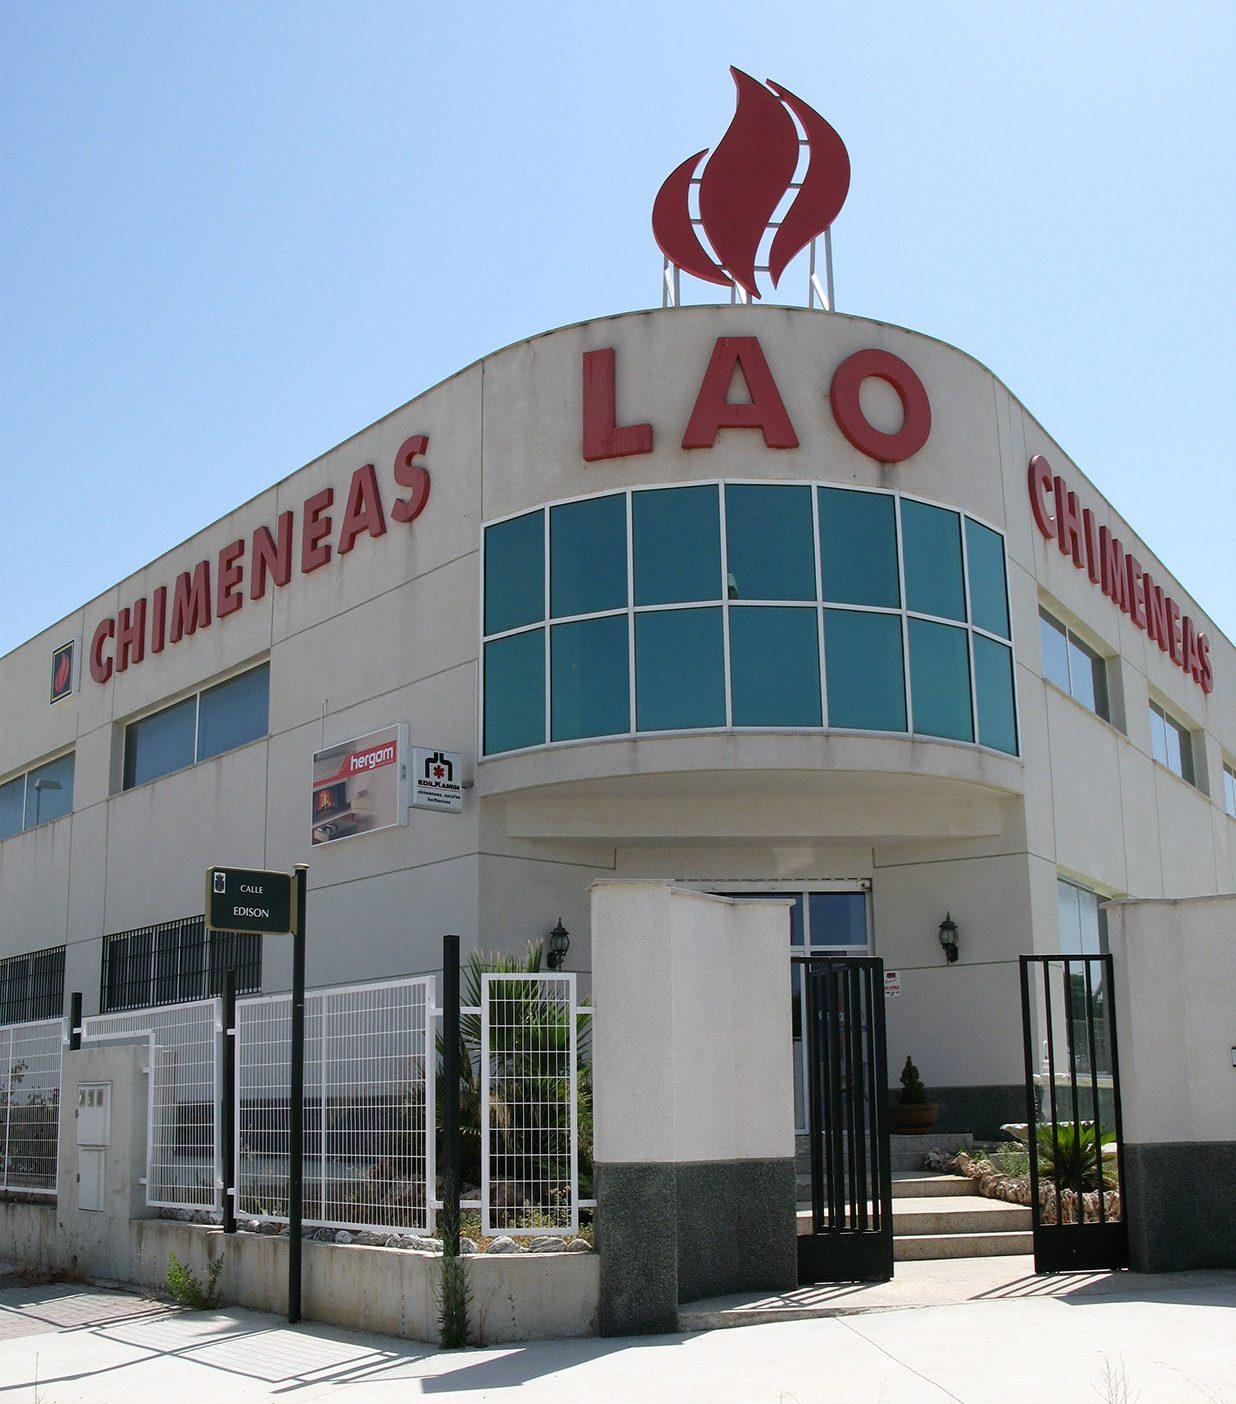 Chimeneas LAO